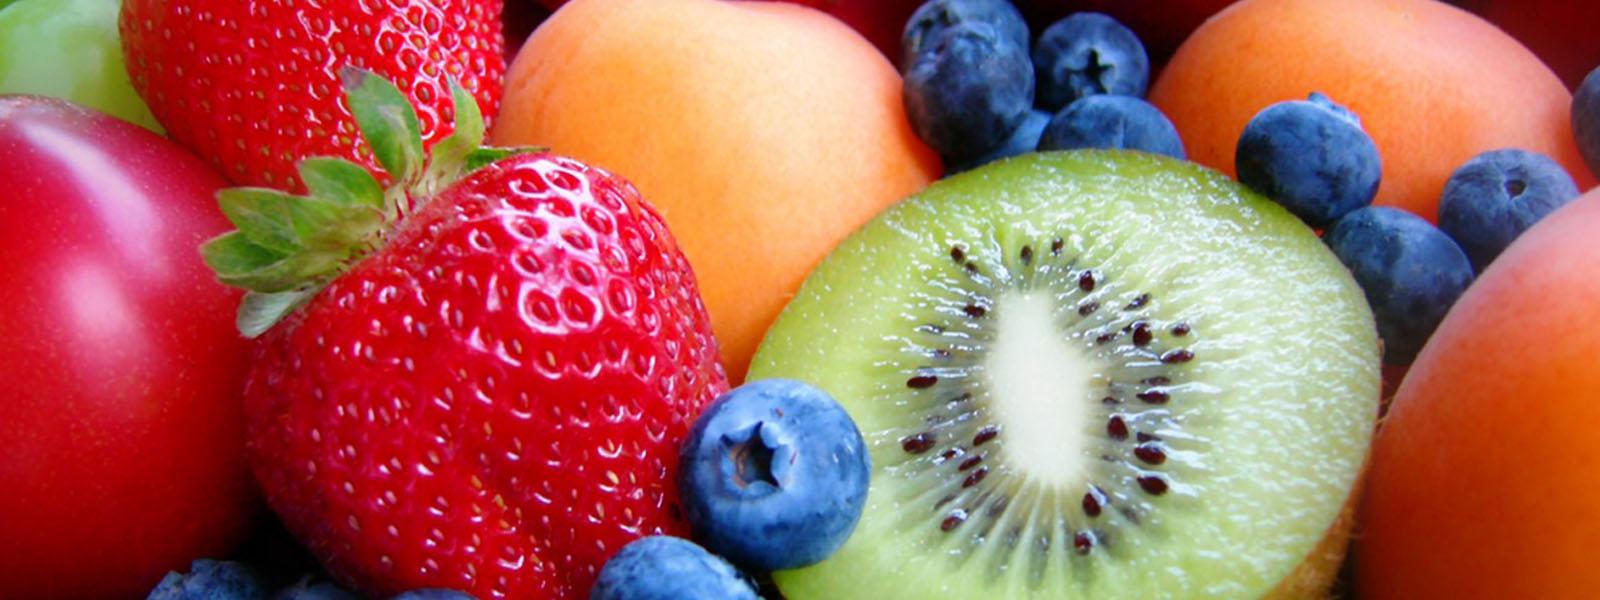 header valerie mery mandeville dieteticienne nutritionniste